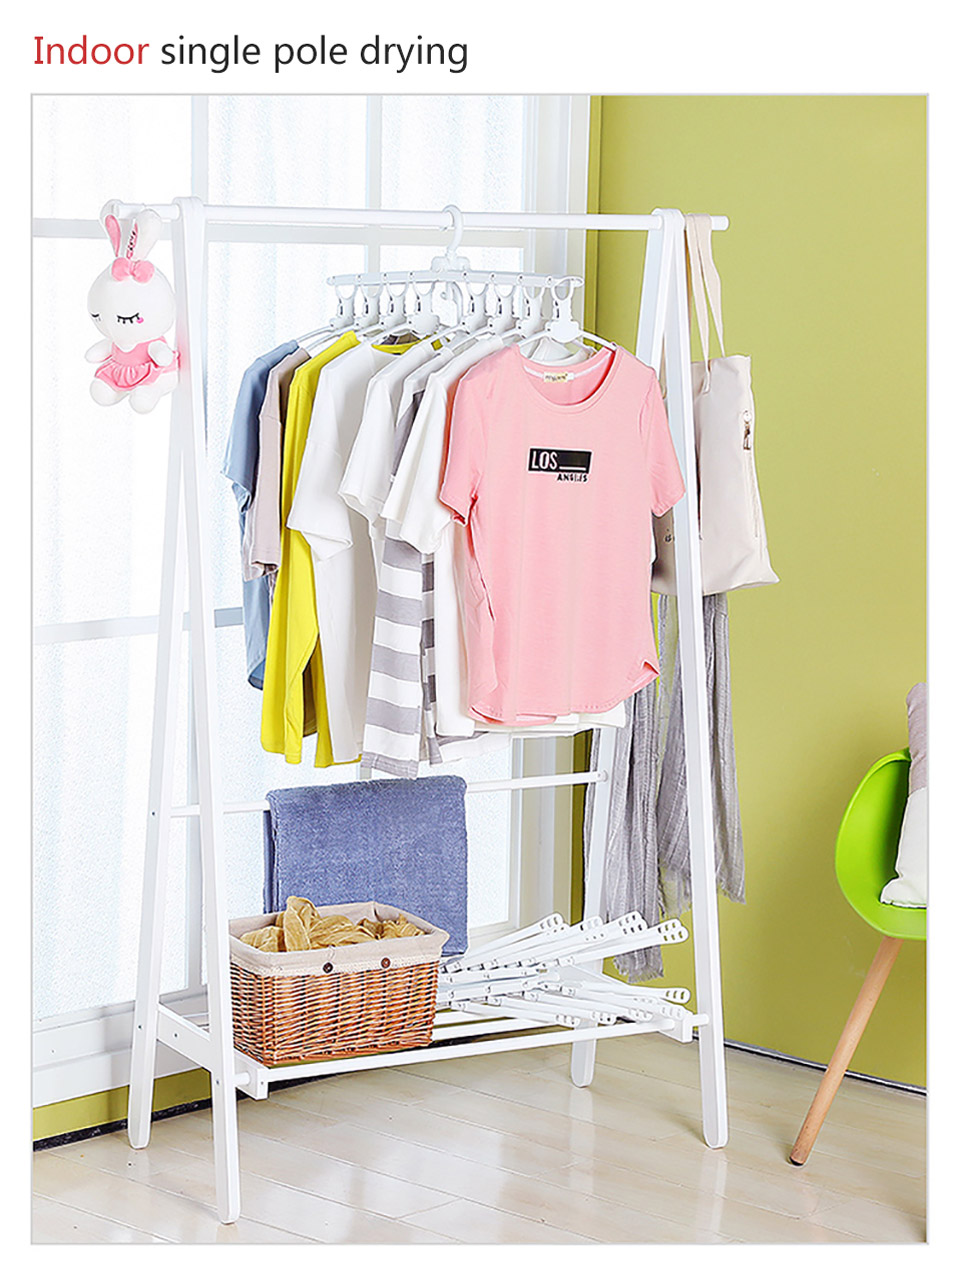 Mytools Magic Clothes Hanger Retract End 2 4 2021 1200 Am Gantungan Baju Single Pole Last Updated 9 17 2018 62905 Pm